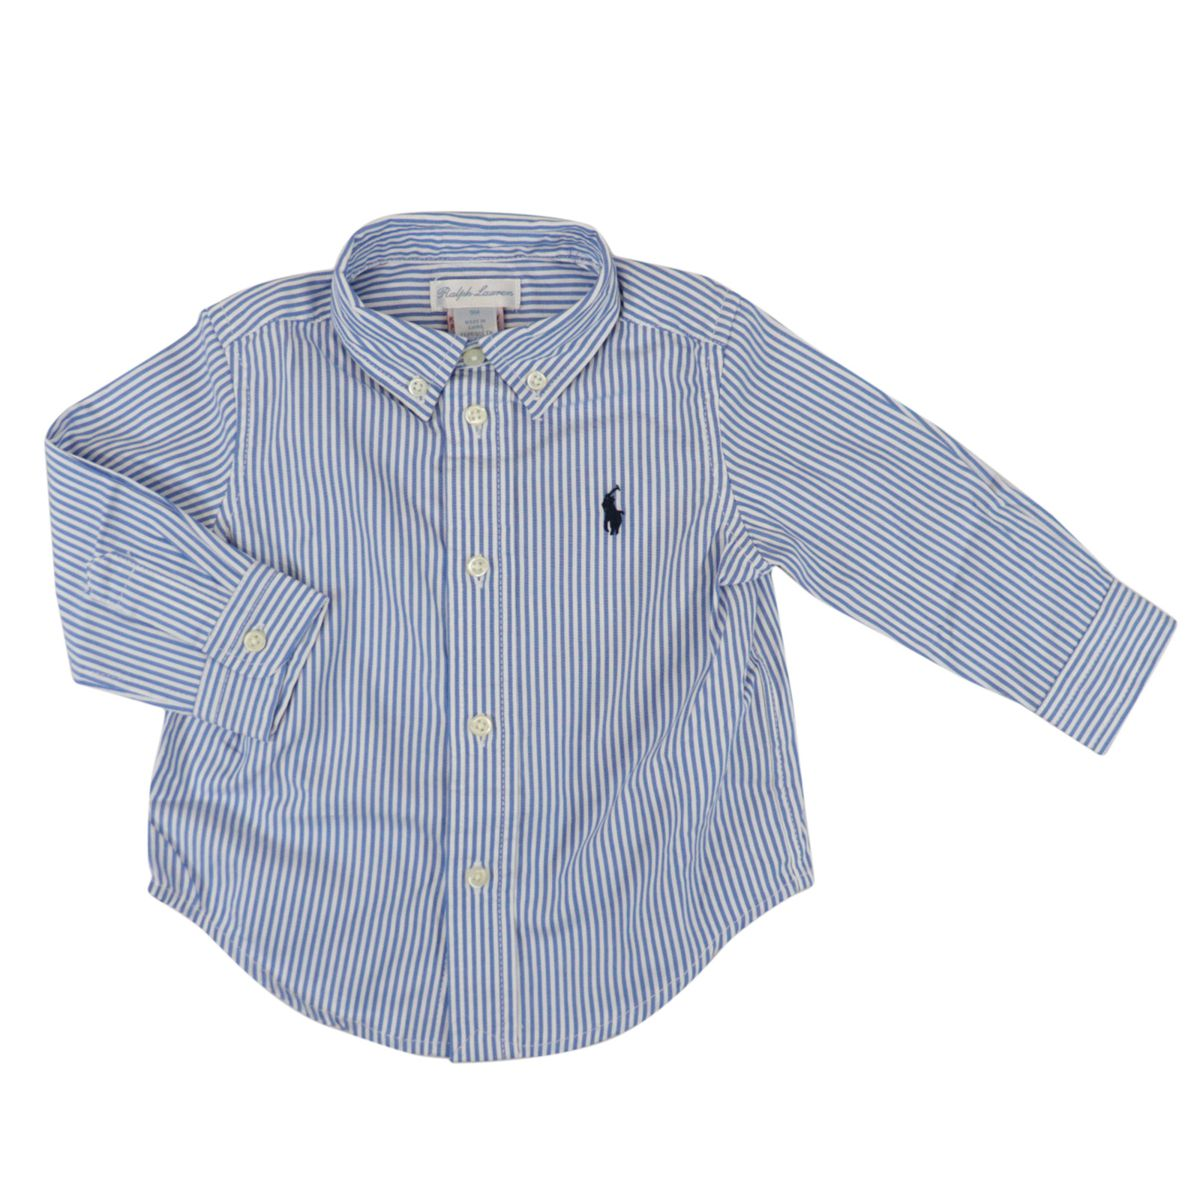 Long-sleeved botton down shirt in cotton Blue / white Polo Ralph Lauren